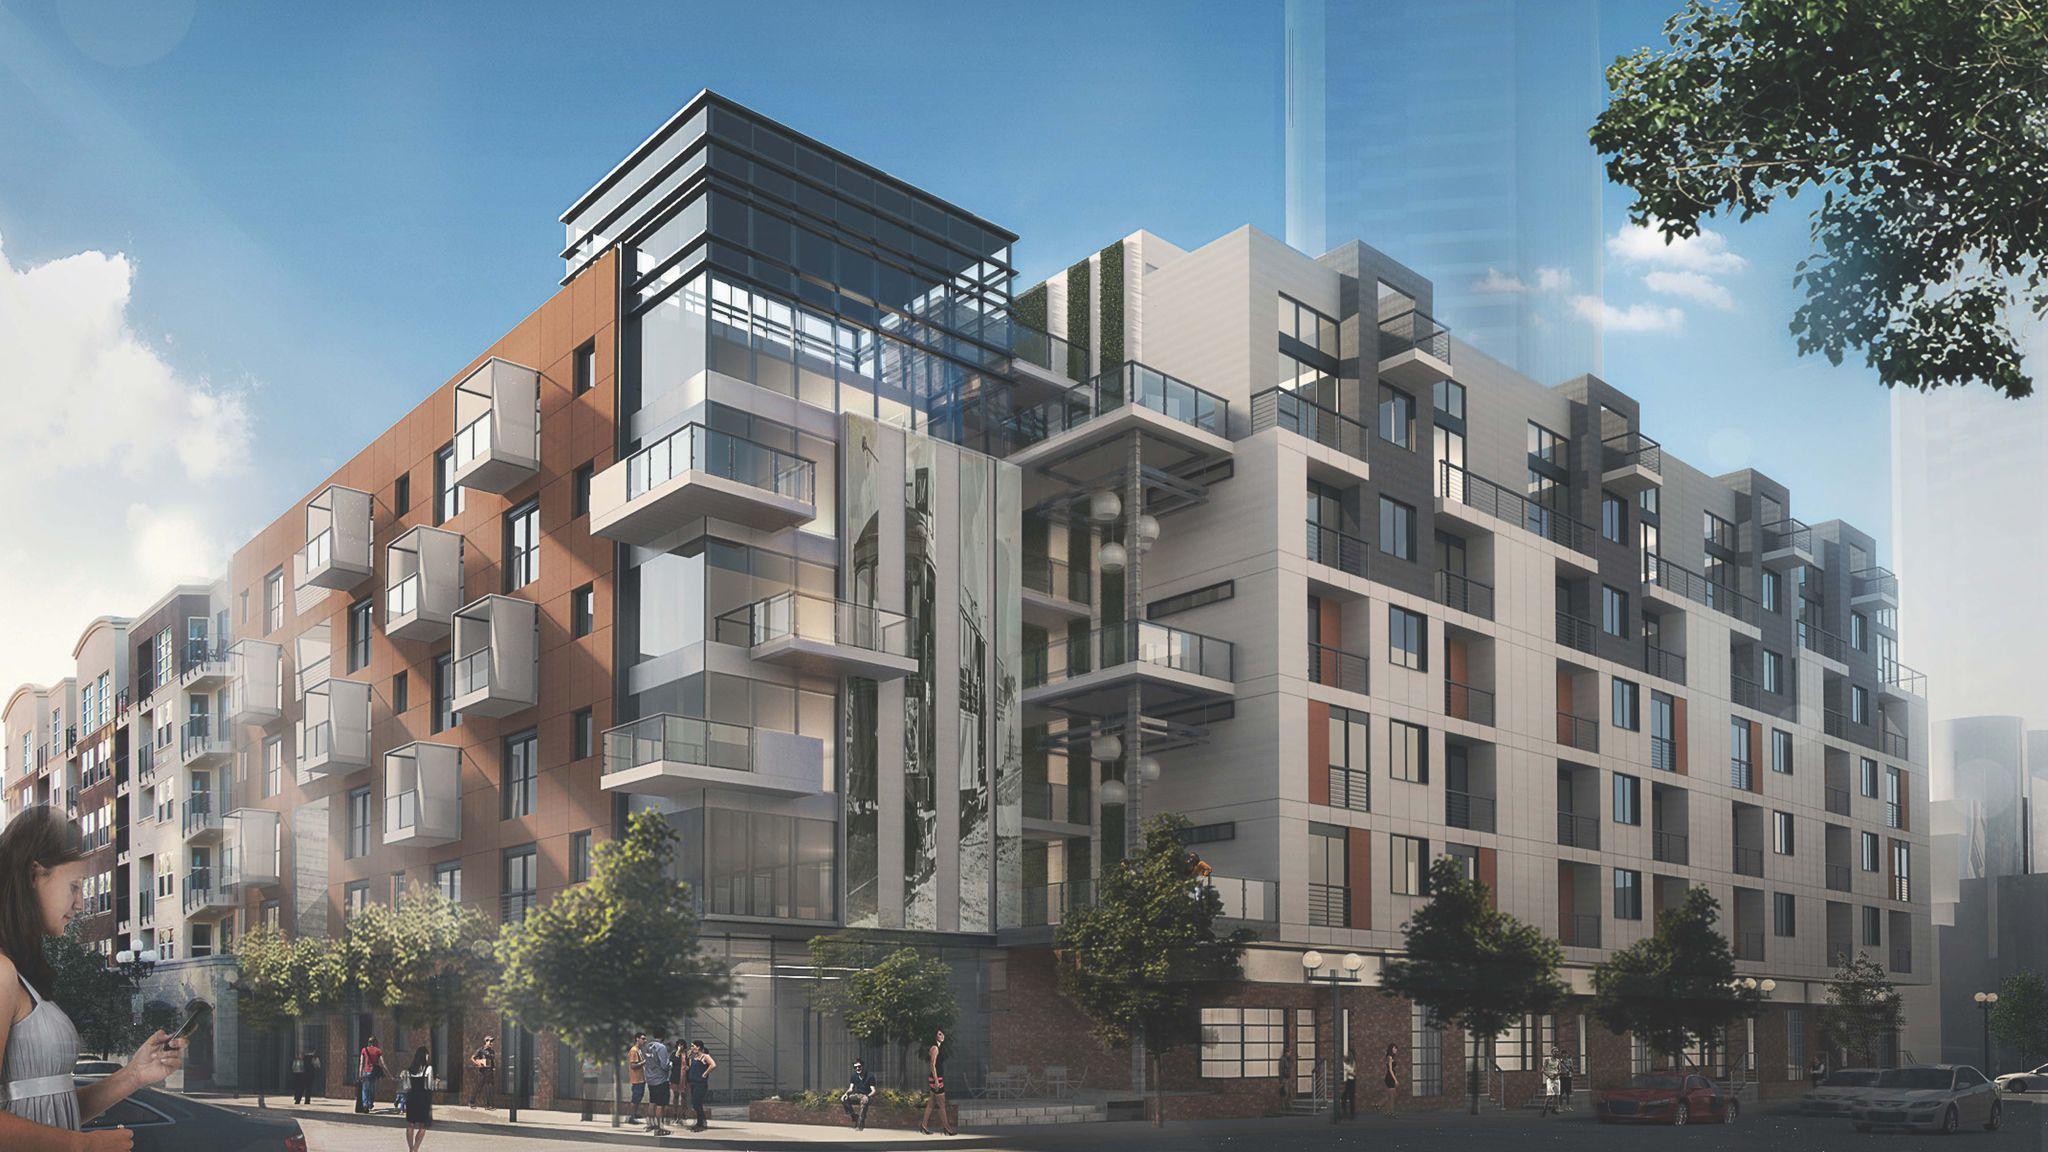 6 story apartment building replacing cost plus store the san diego union tribune - Apartment buildings san diego ...